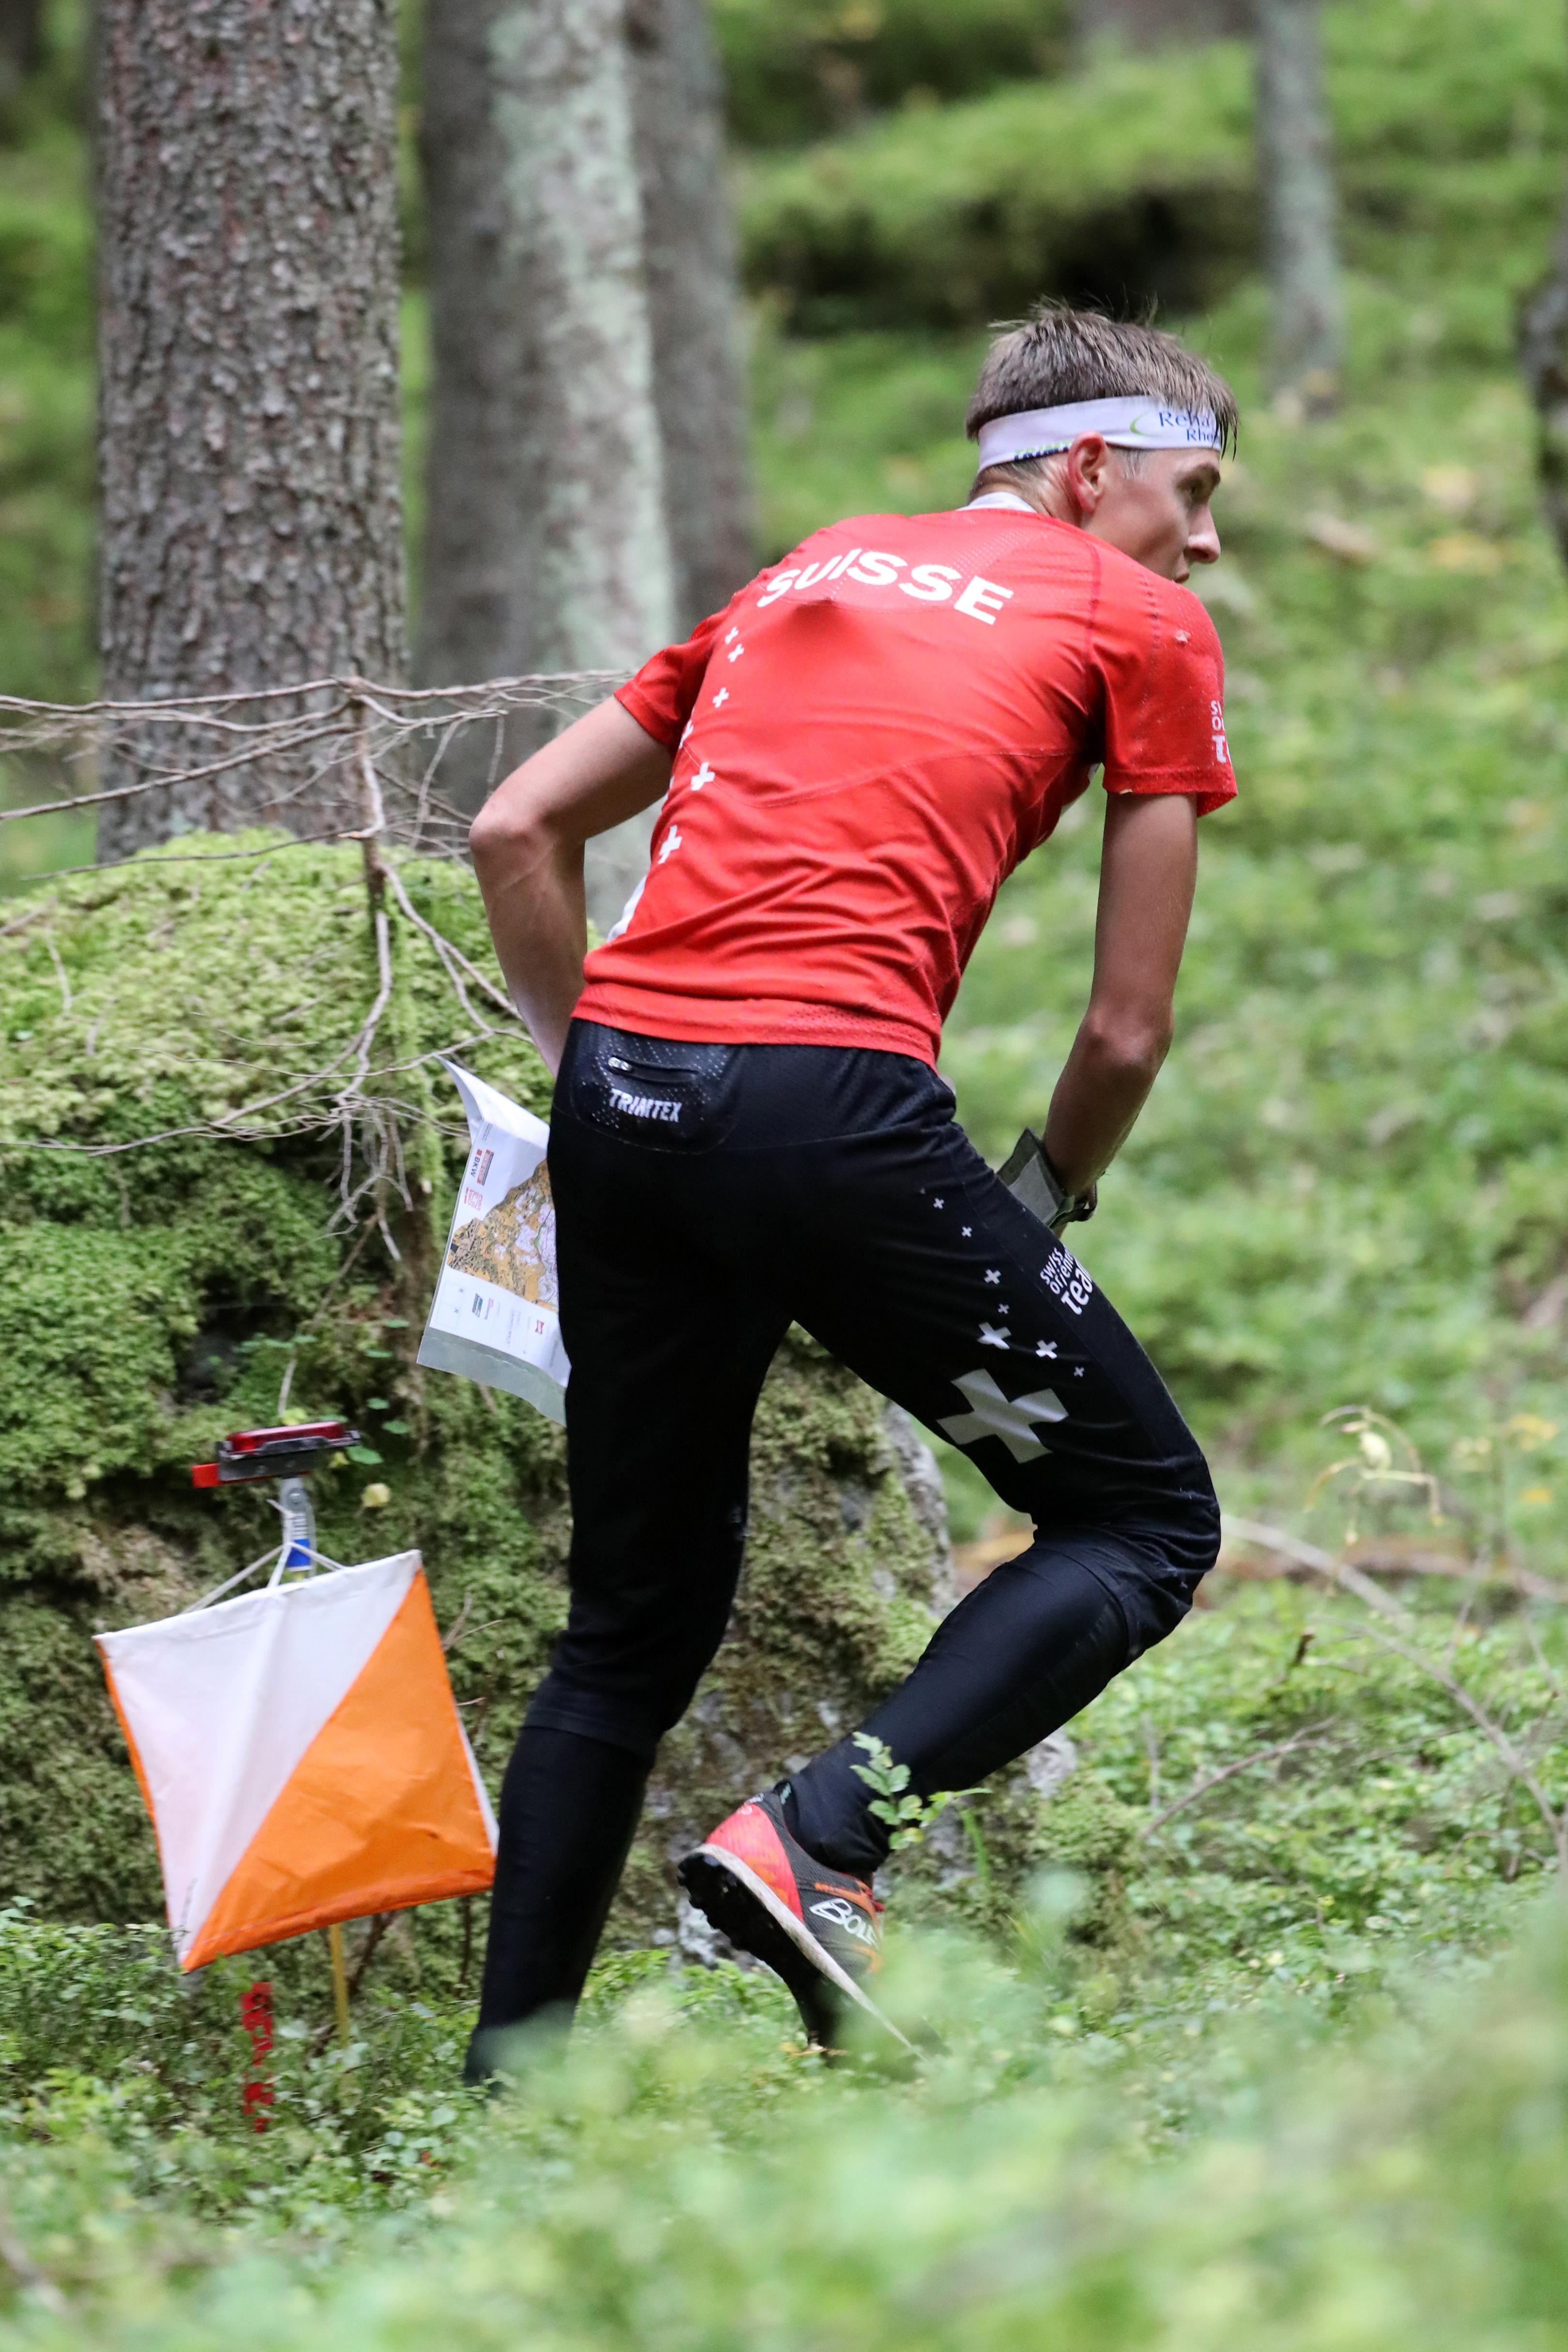 Matthias Kyburz (SUI, Winner) – Middle Distance Men at the EGK Orienteering World Cup Final 2017 in Grindelwald / Switzerland